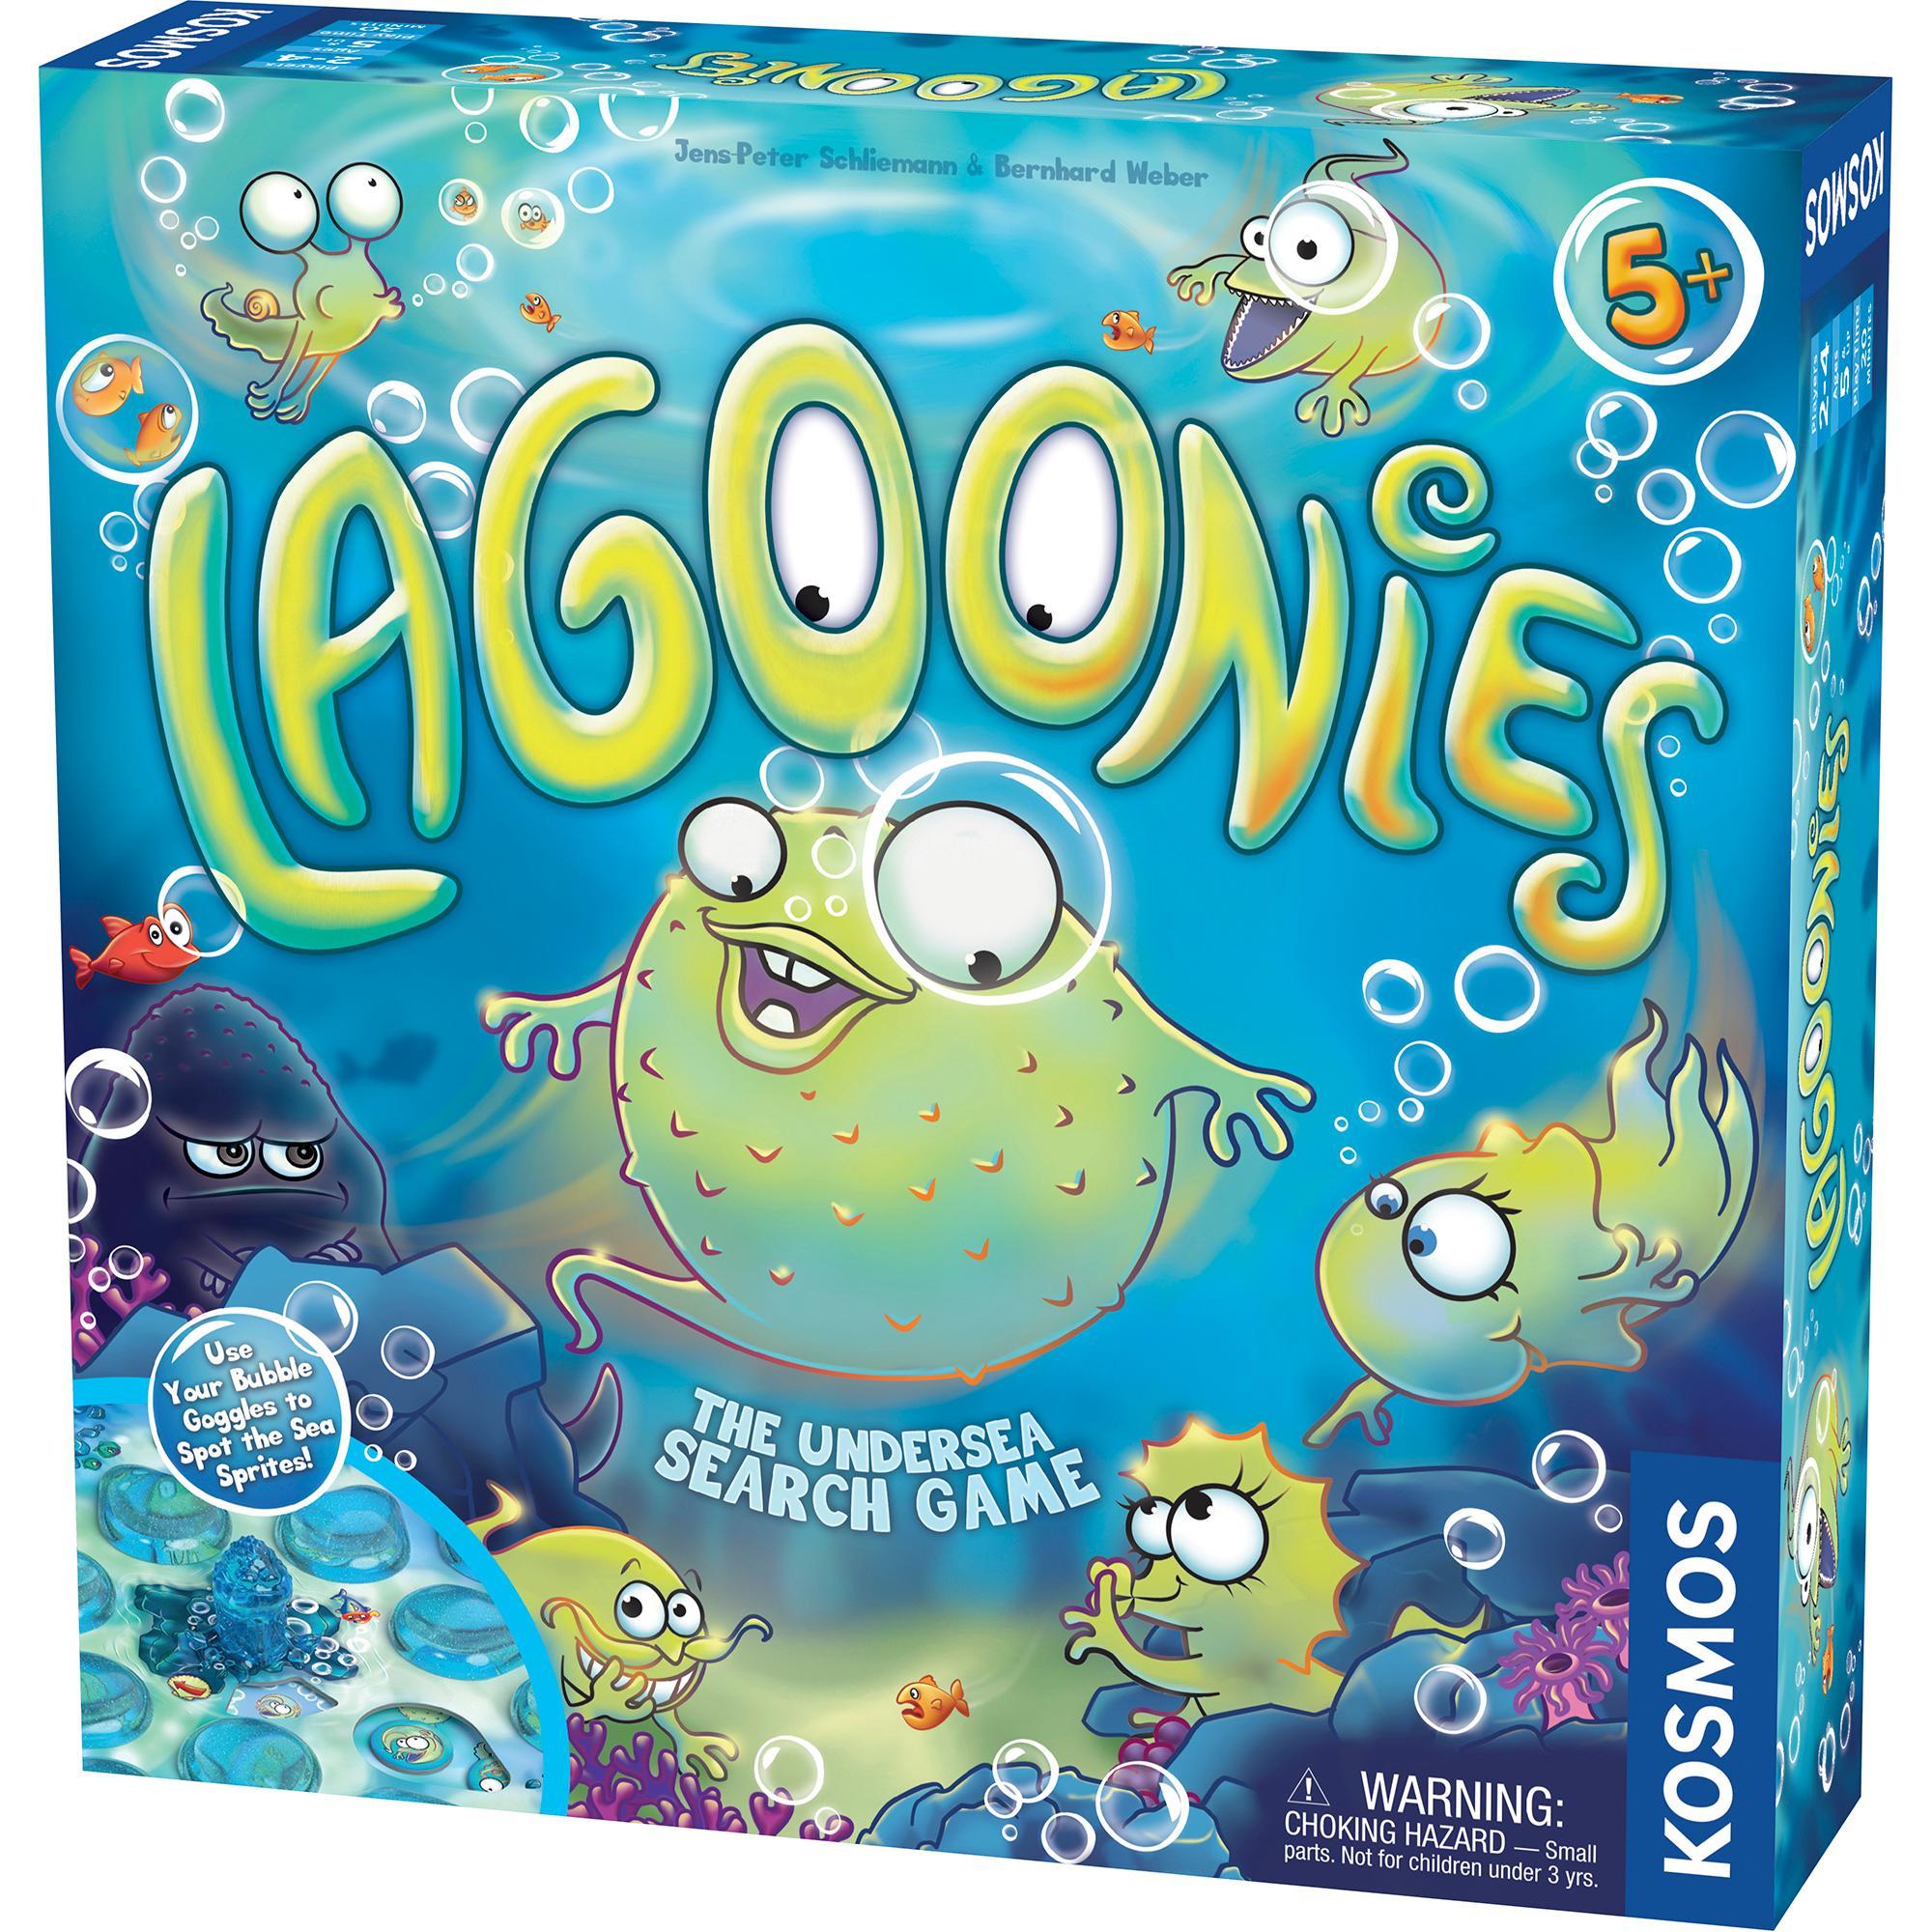 amazon com thames kosmos lagoonies the undersea search game rh amazon com